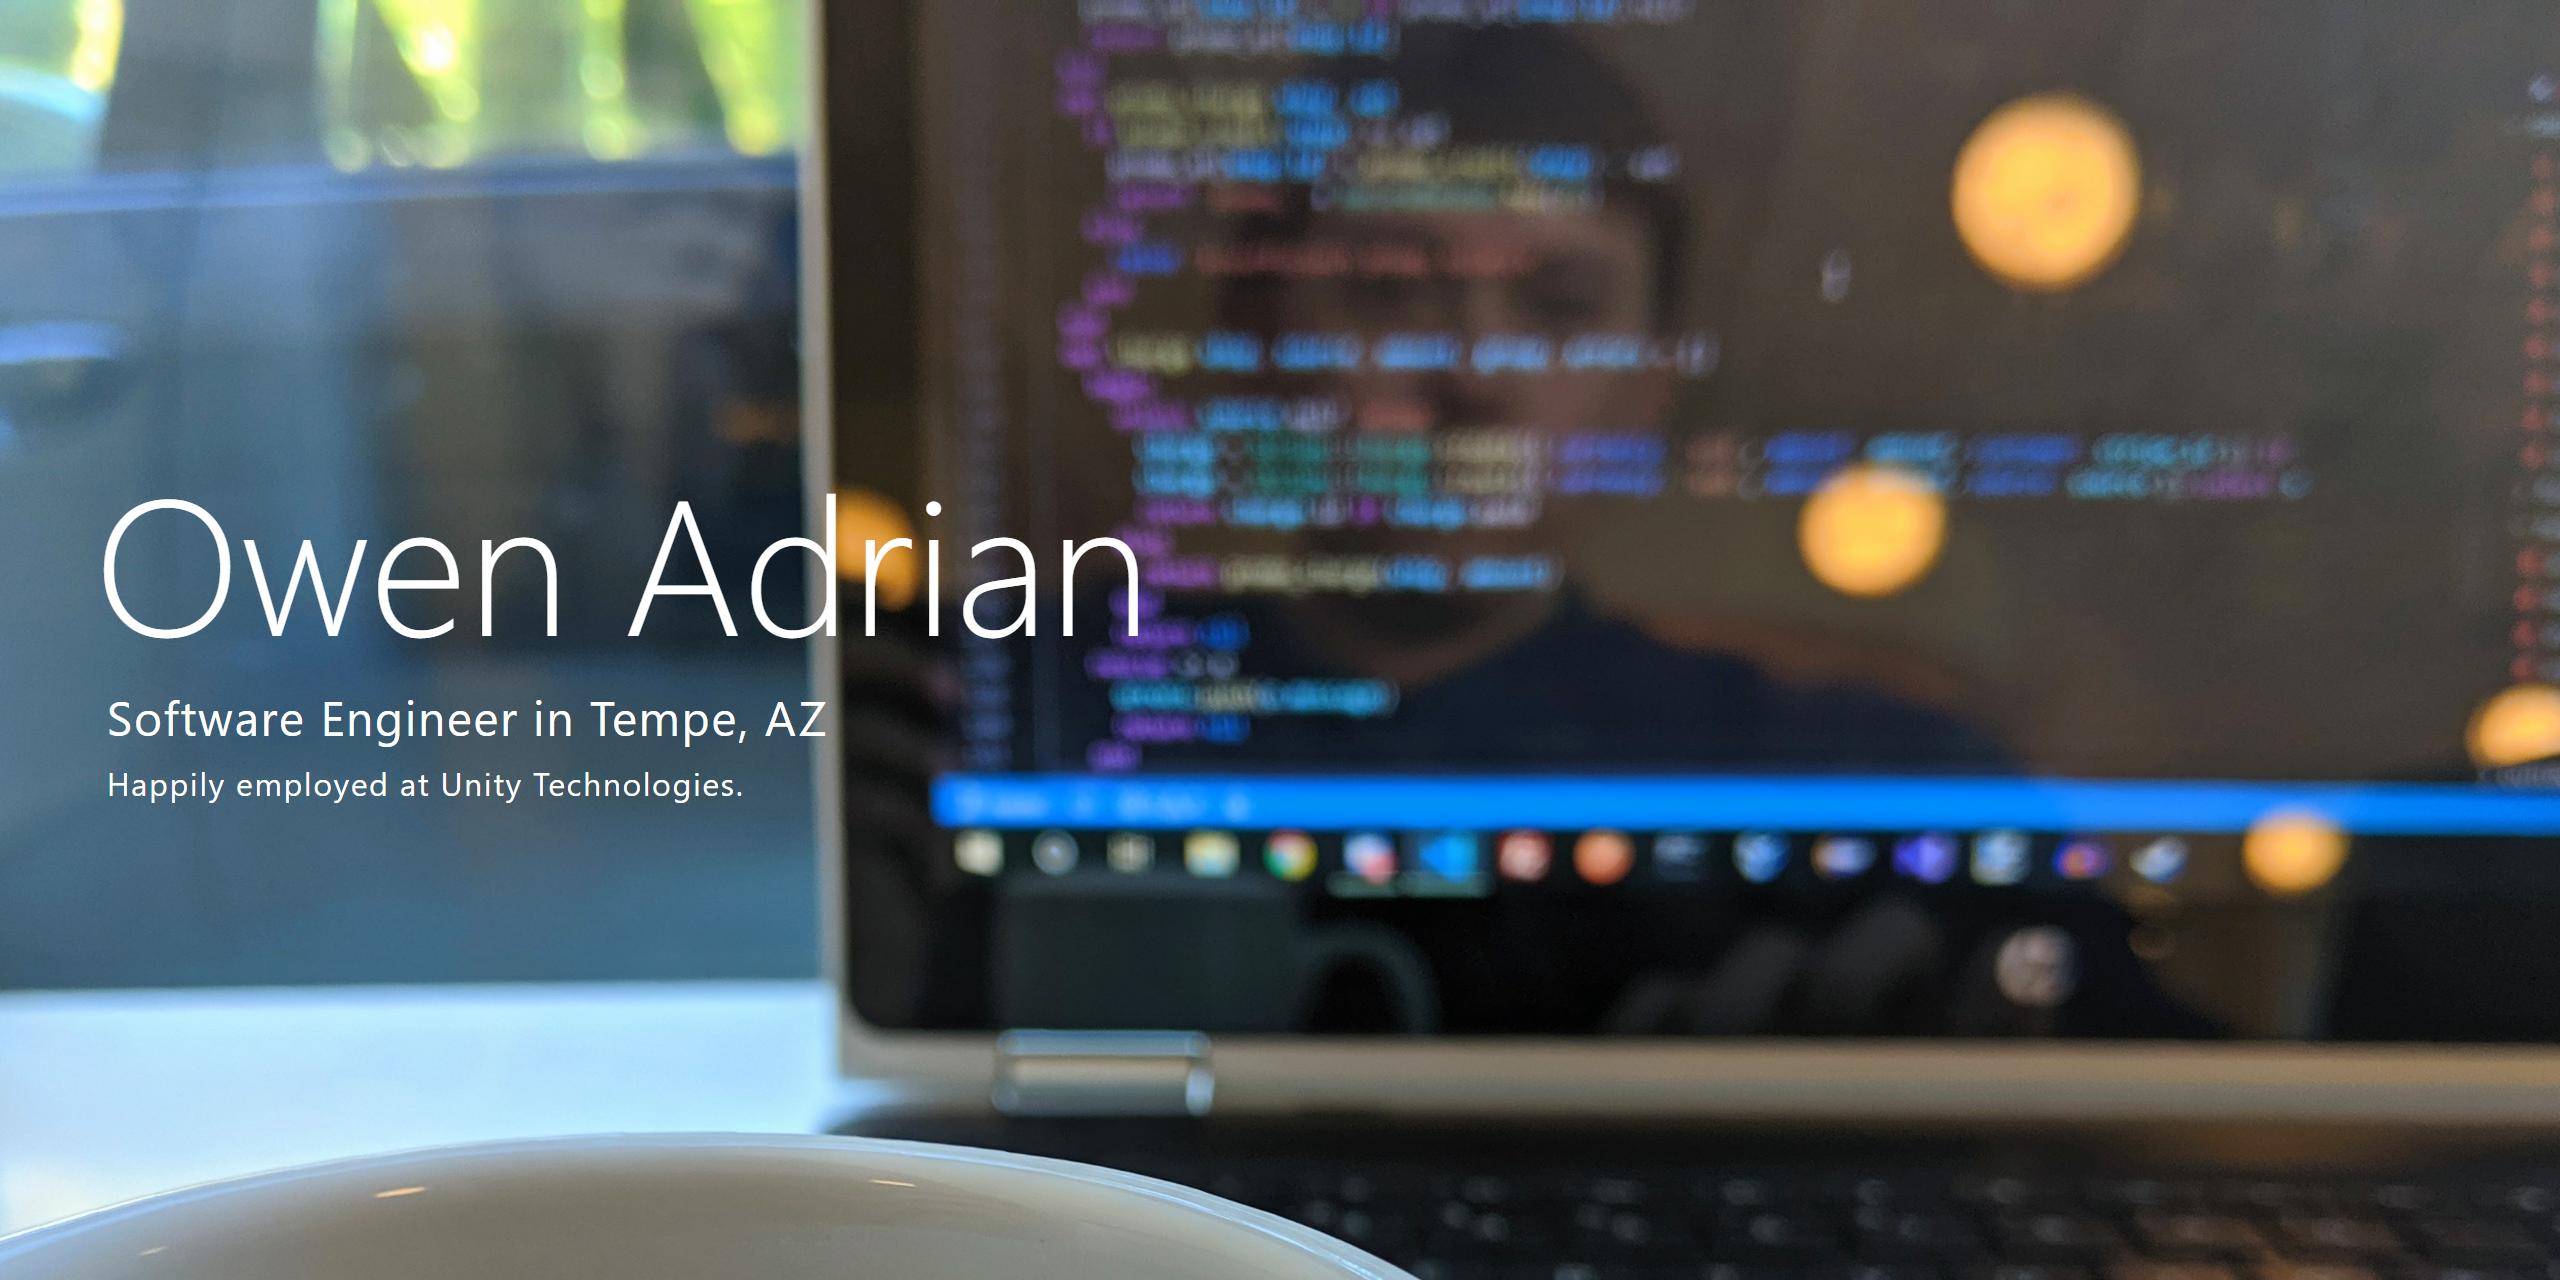 Hi, I'm Owen Adrian, I've been developing web apps in Rails since 2014